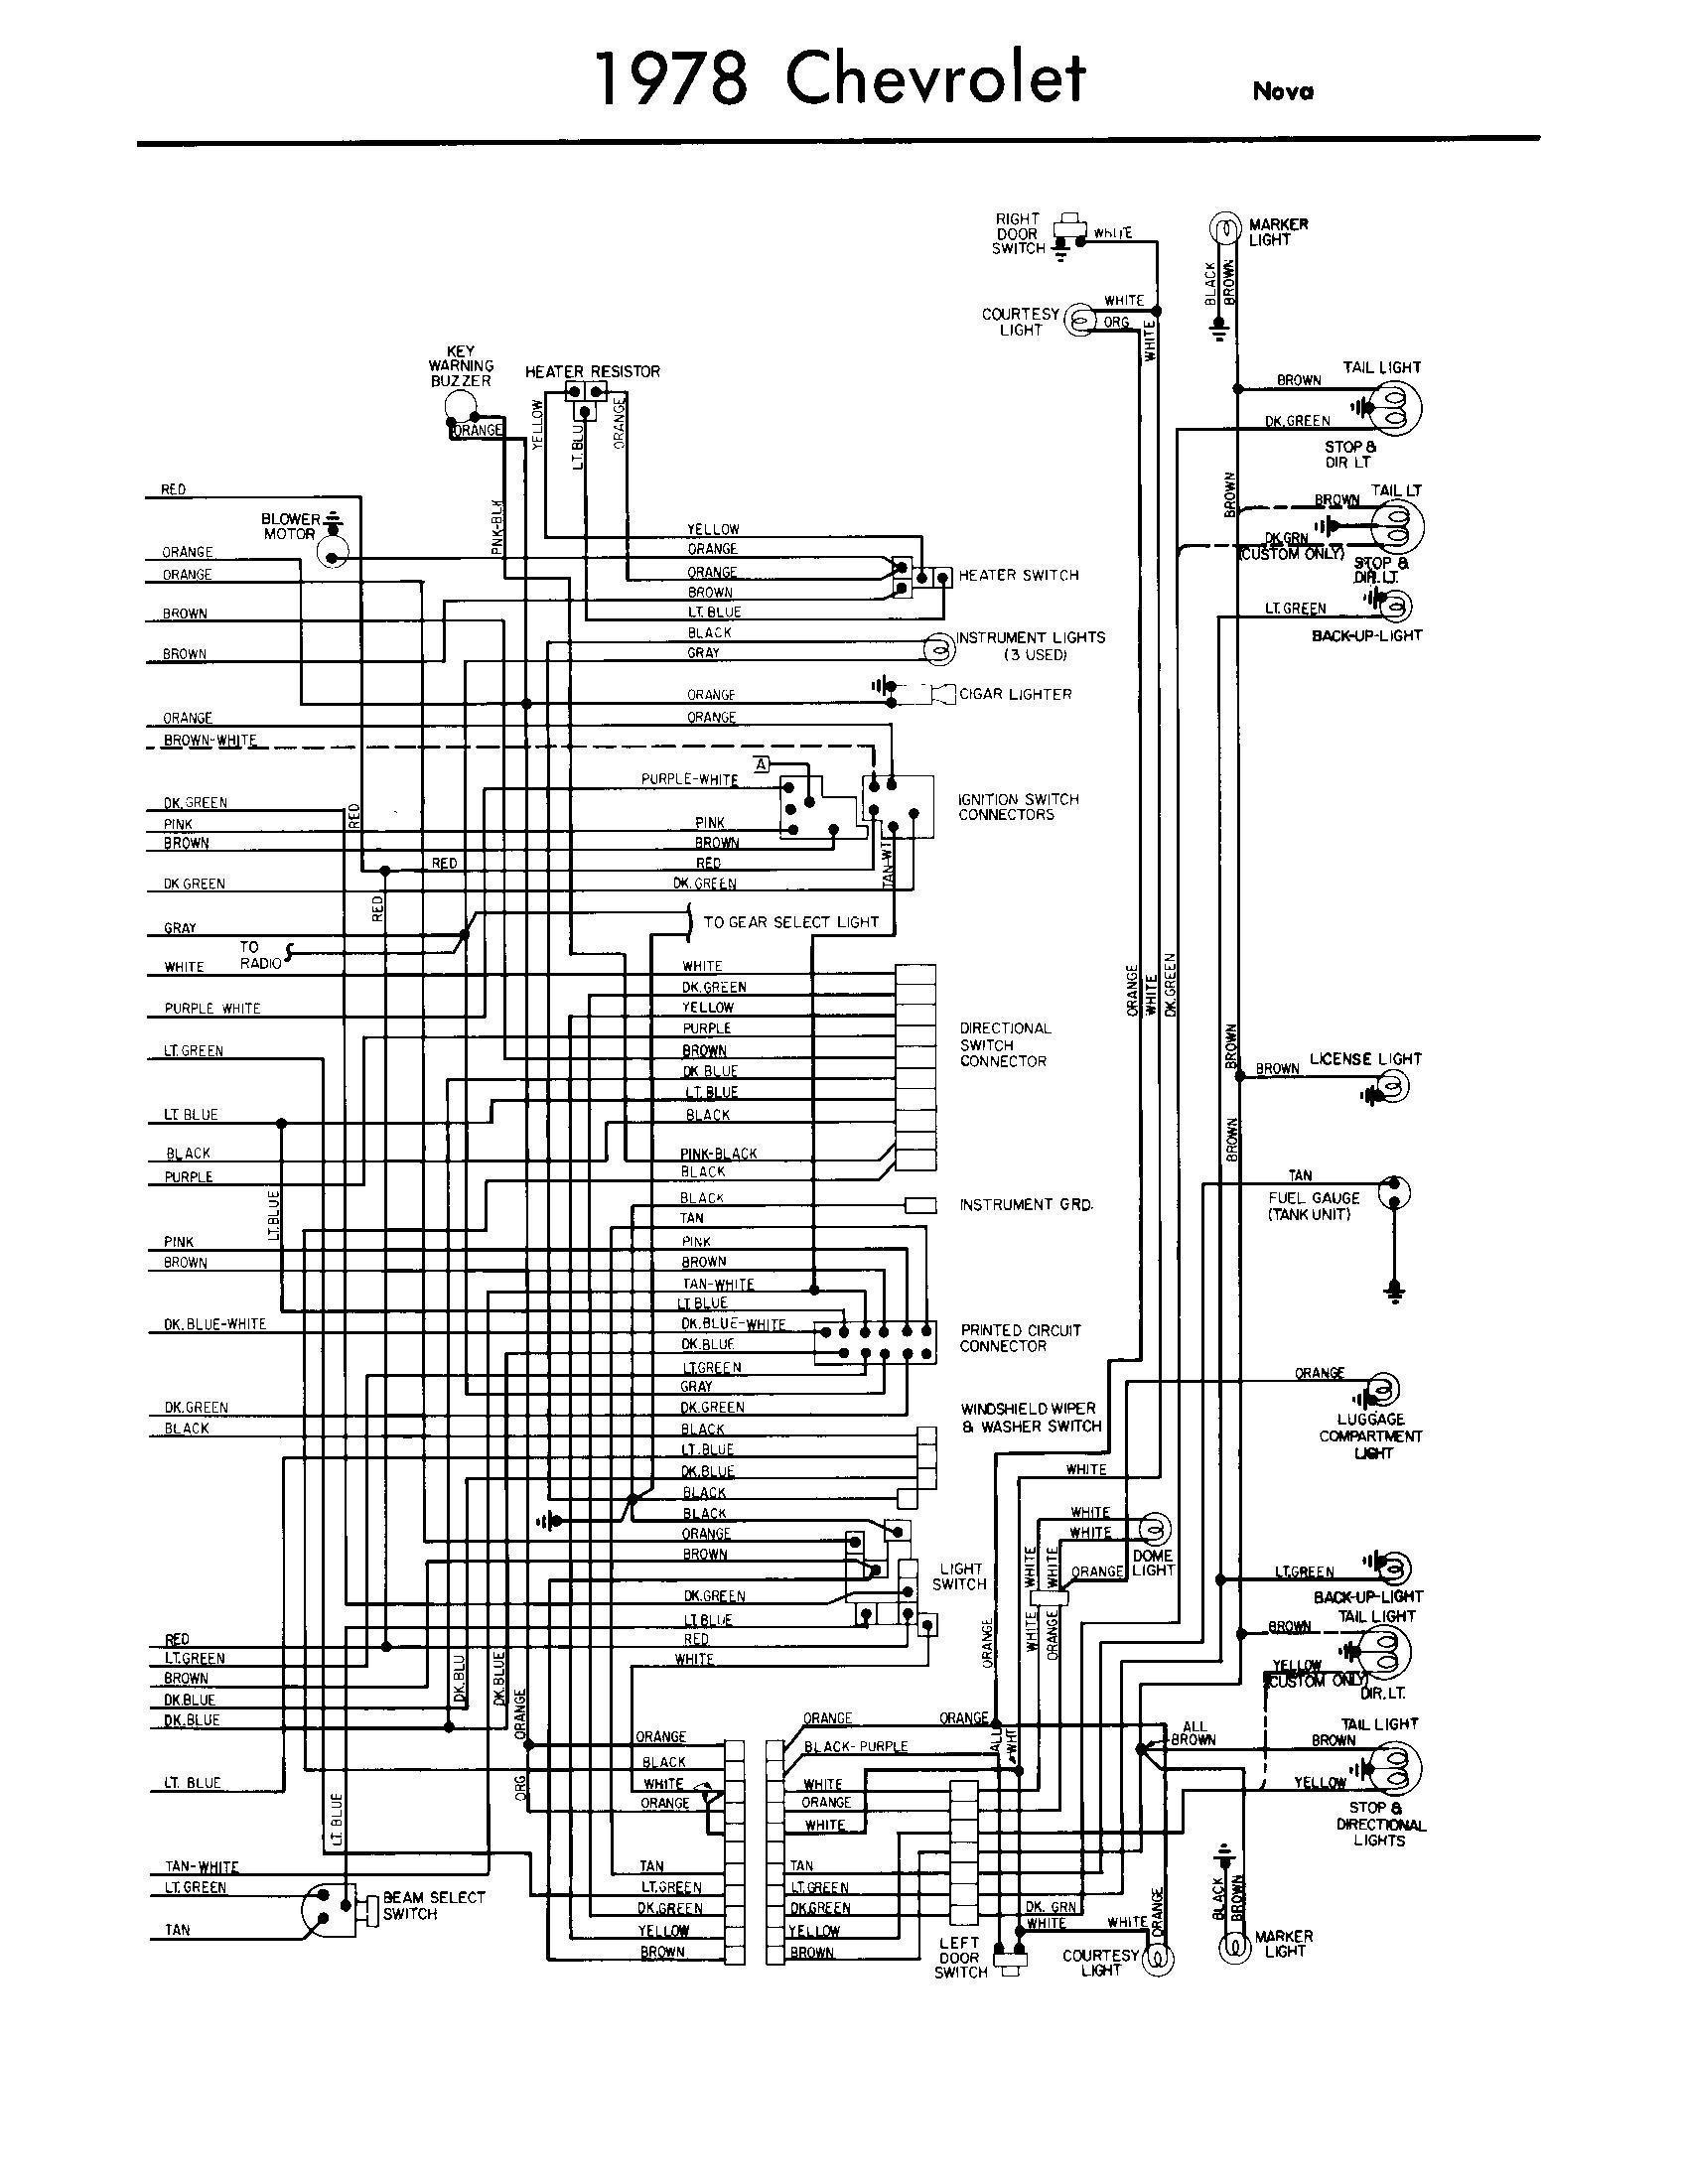 1976 chevy wiring diagram - wiring diagram for gm light switch -  light-switch.deco-doe5.decorresine.it  wiring diagram resource